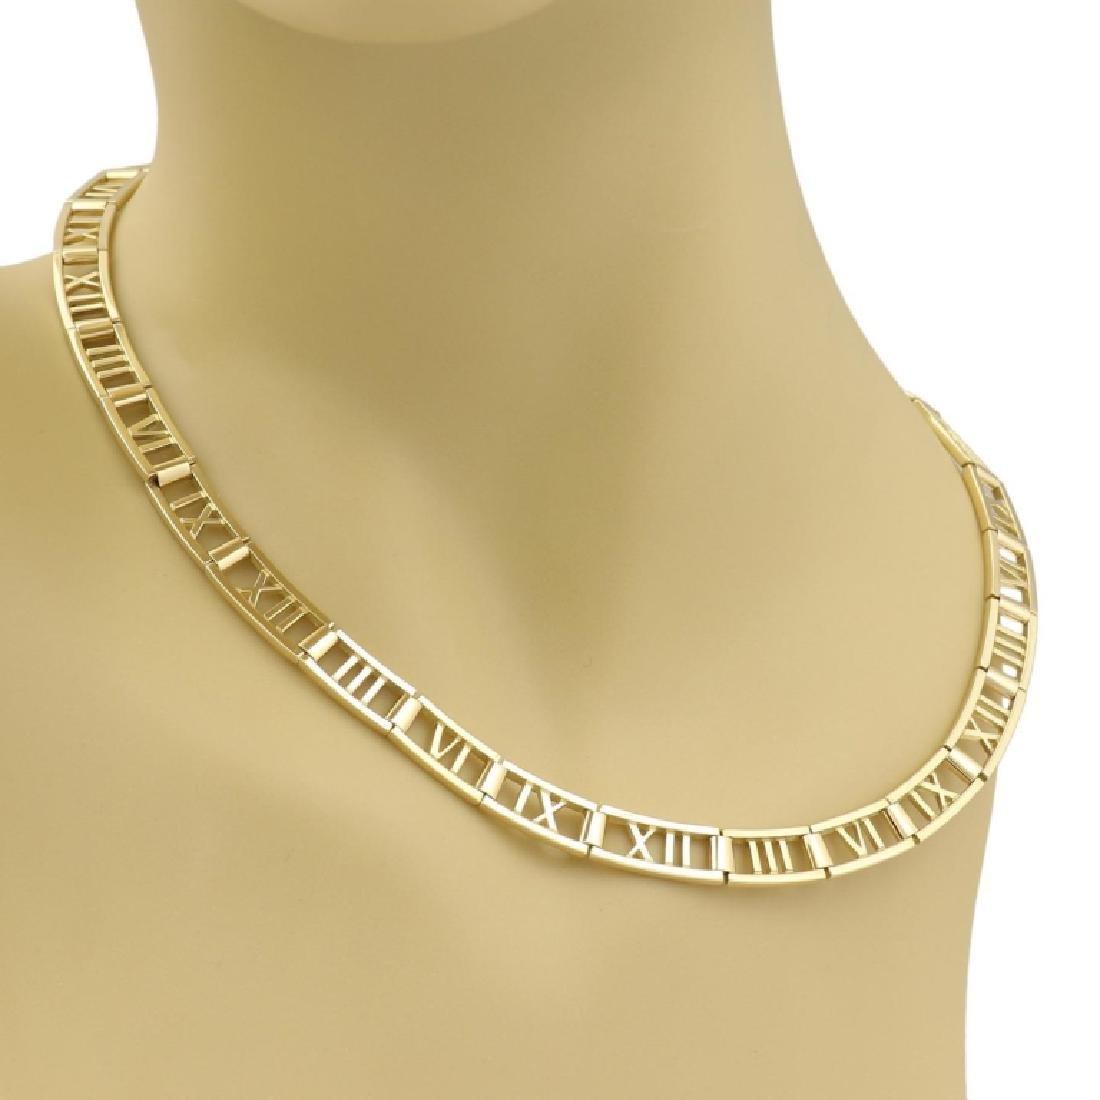 Tiffany & Co. 18k Gold Roman Numeral Necklace - 4